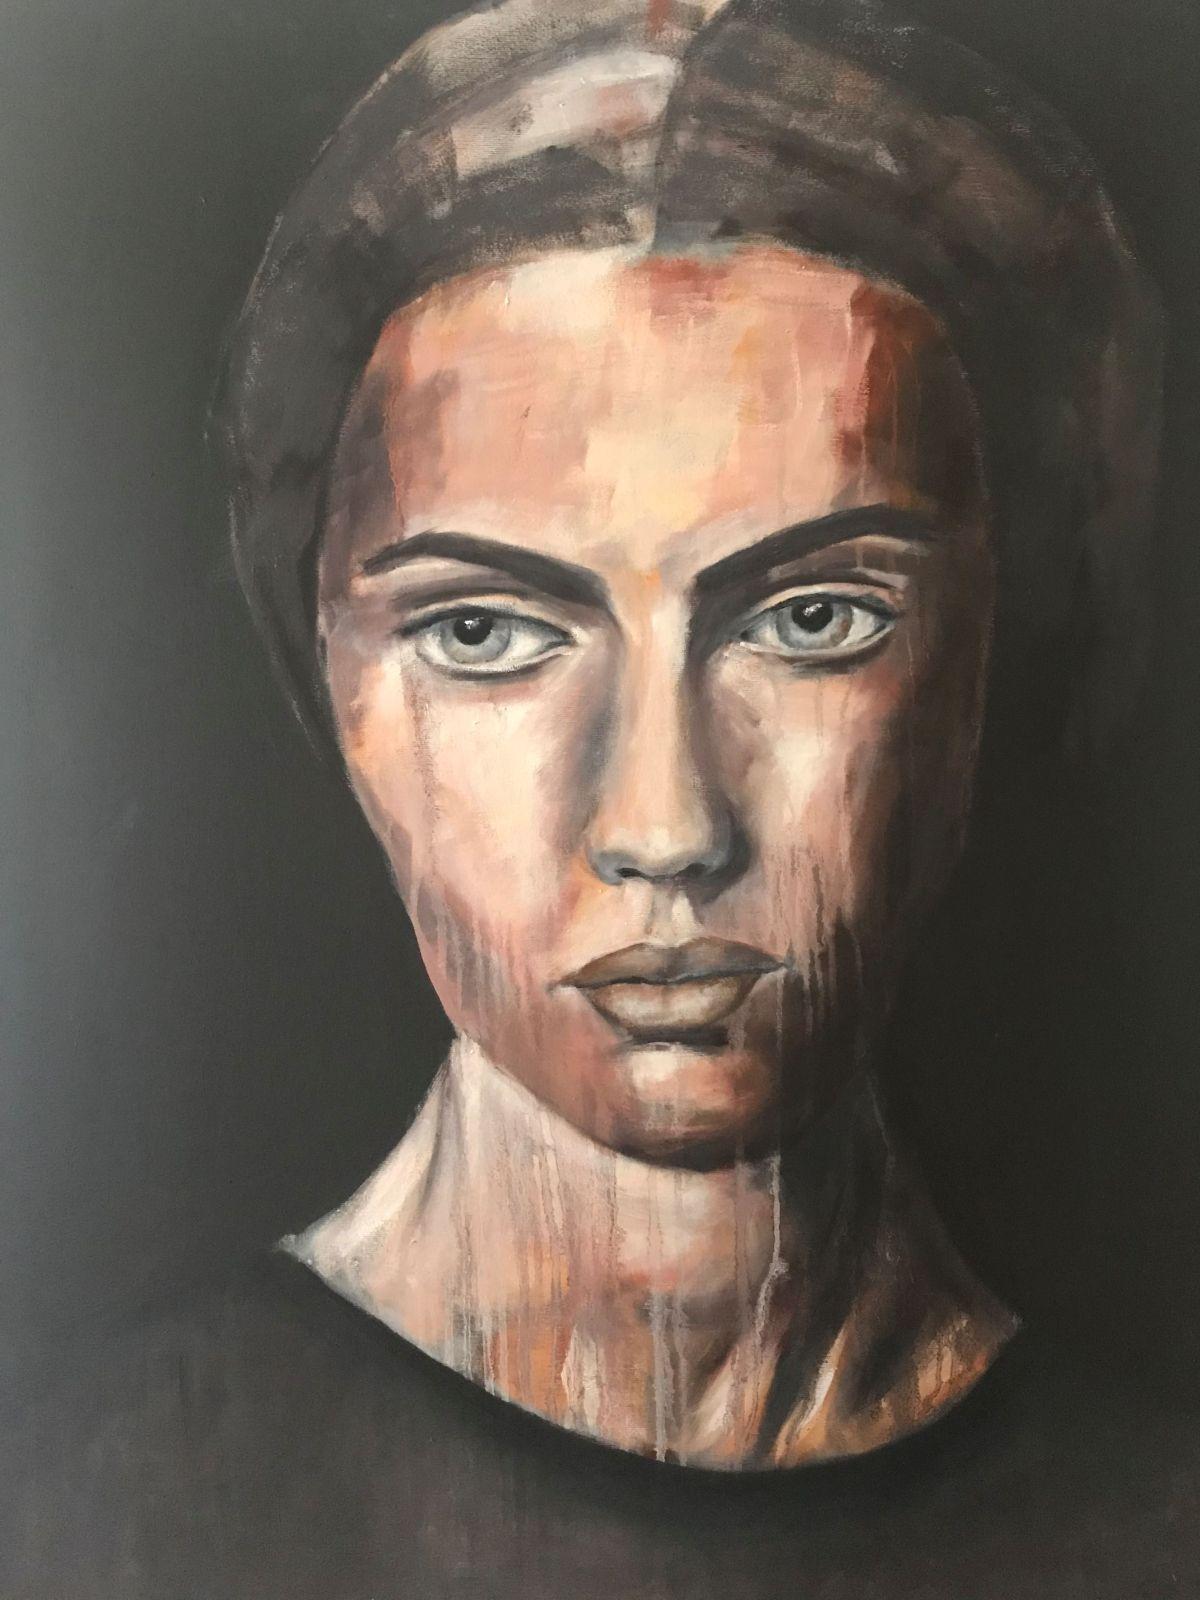 Porträt 'Erin', Öl auf Leinwand, 100 cm h x 80 cm b x 3 cm t